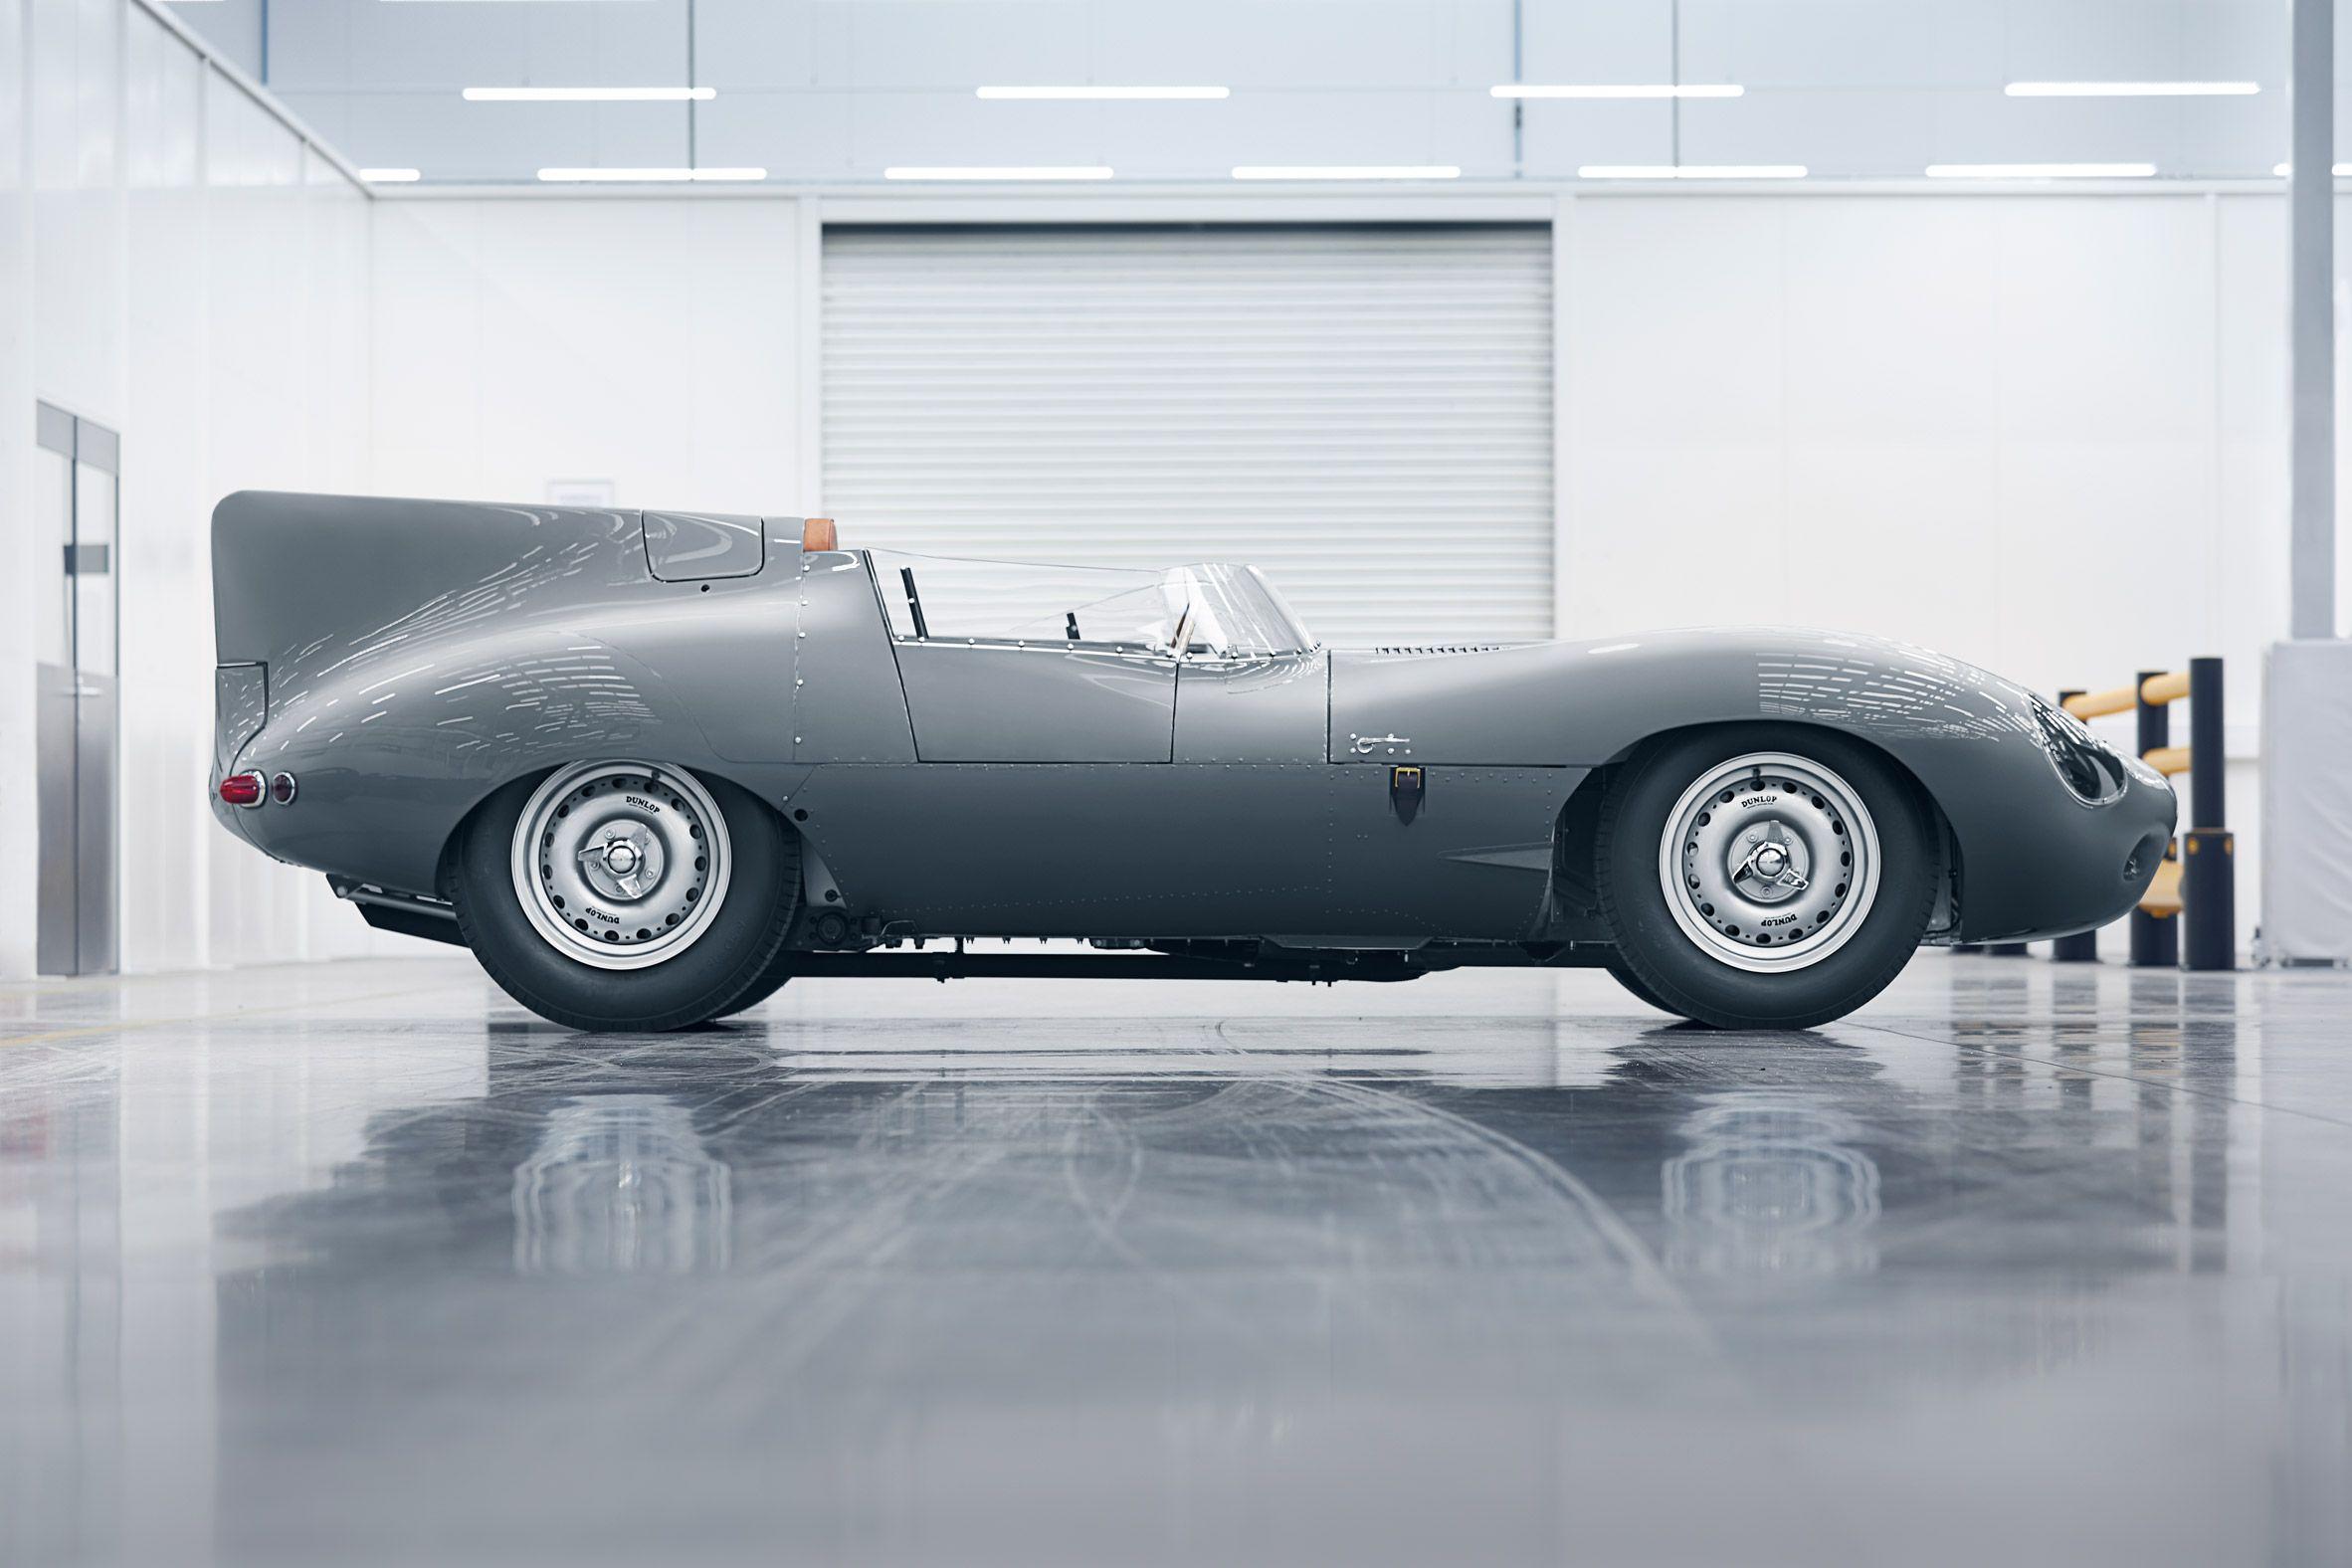 British car manufacturer Jaguar has announced that it will begin ...